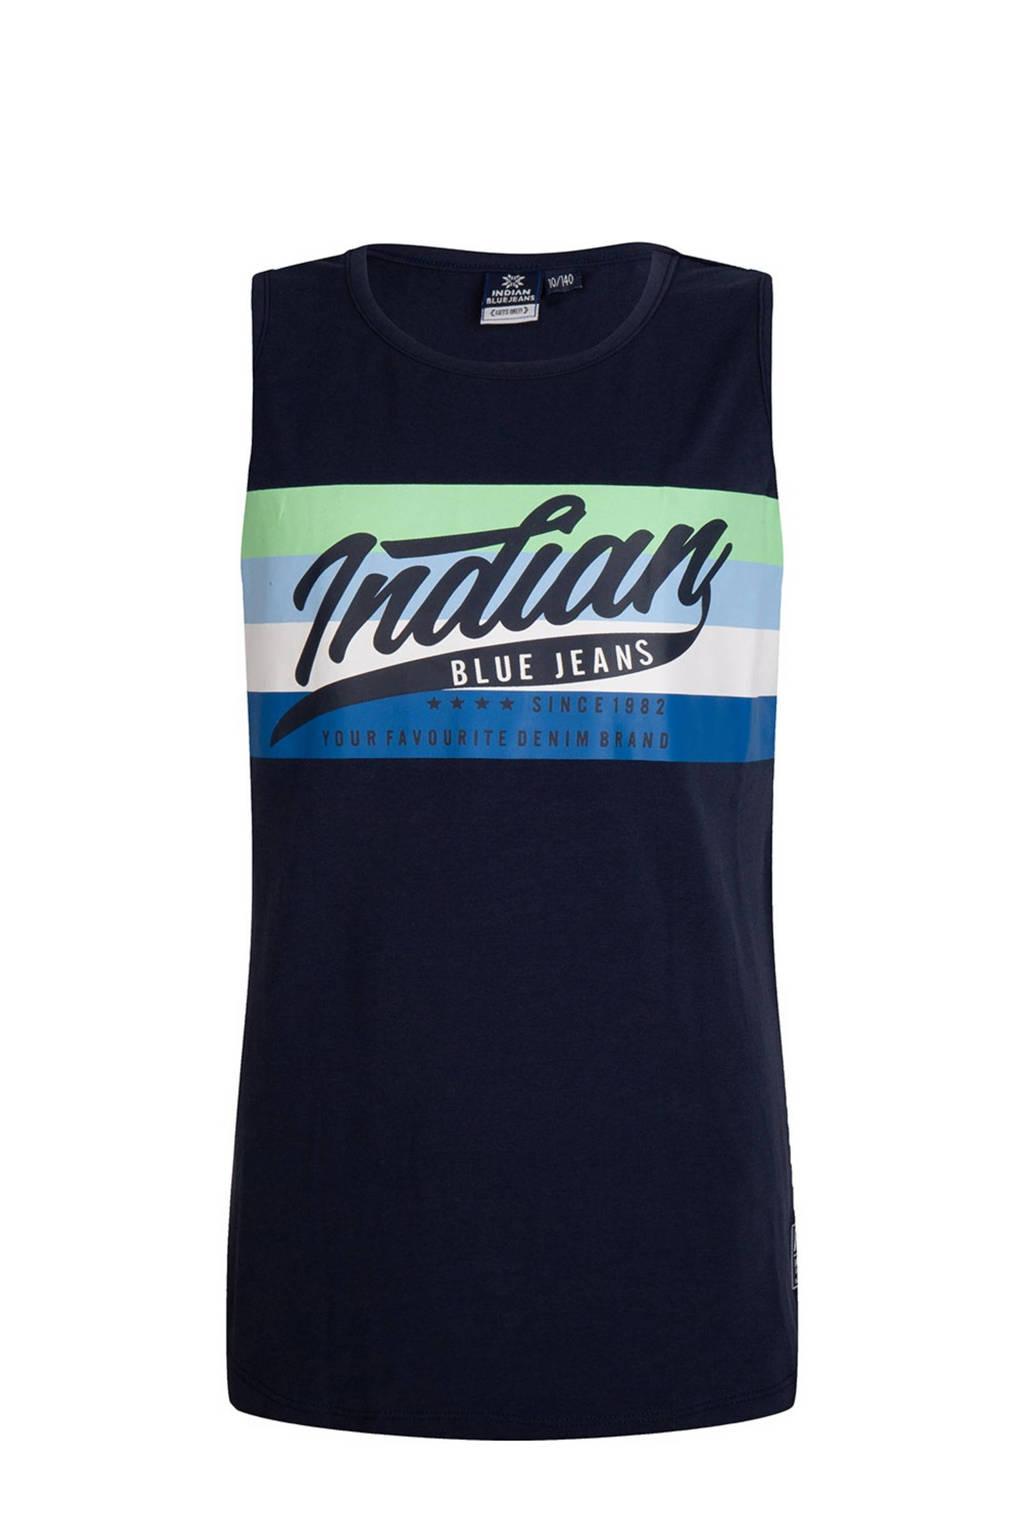 Indian Blue Jeans mouwloos T-shirt met printopdruk donkerblauw, Donkerblauw